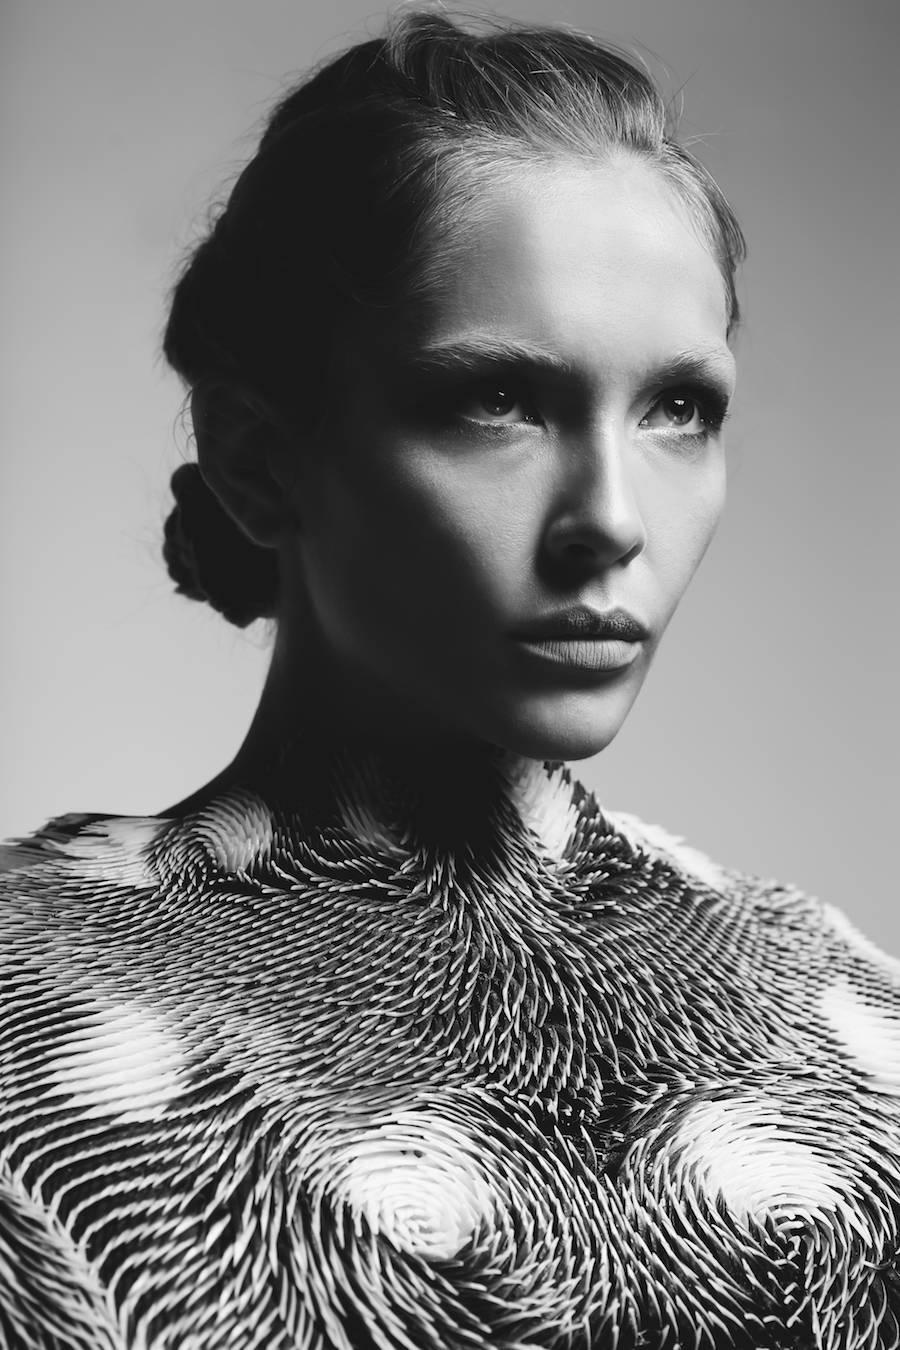 Credits: Editor - Charlie Nordstrom. Cinematographers: Charlie Nordstrom, Elena Kulikova. Models: Al